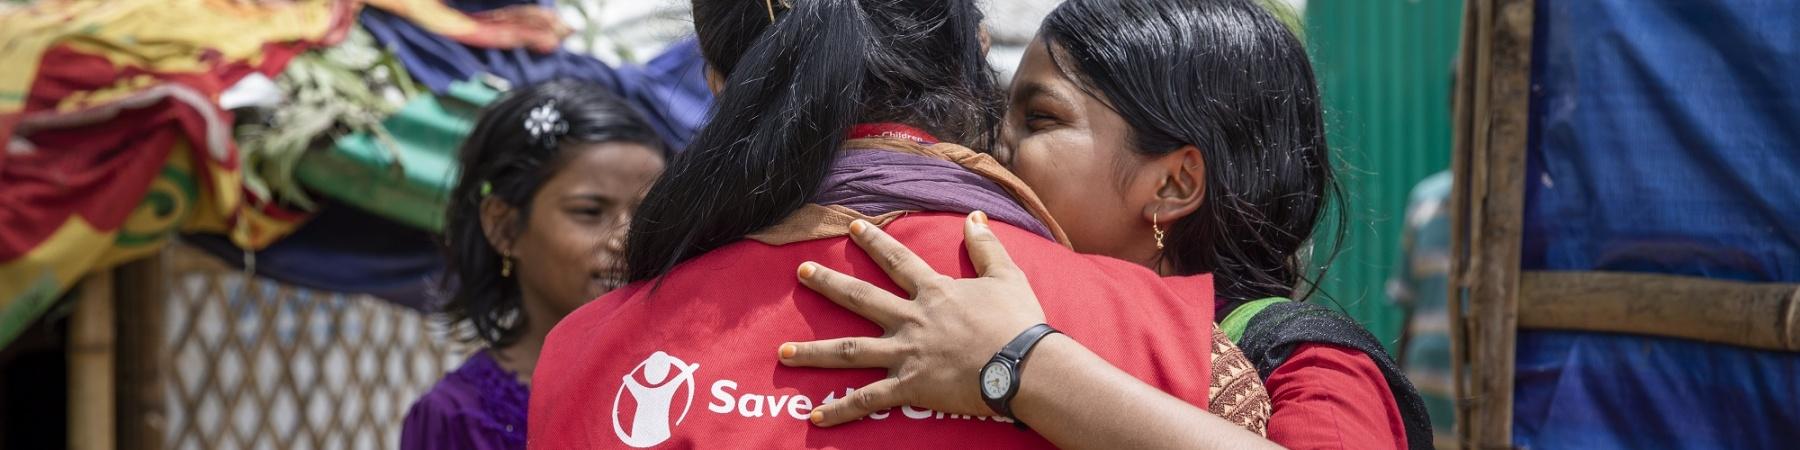 Save the Children in Bangladesh